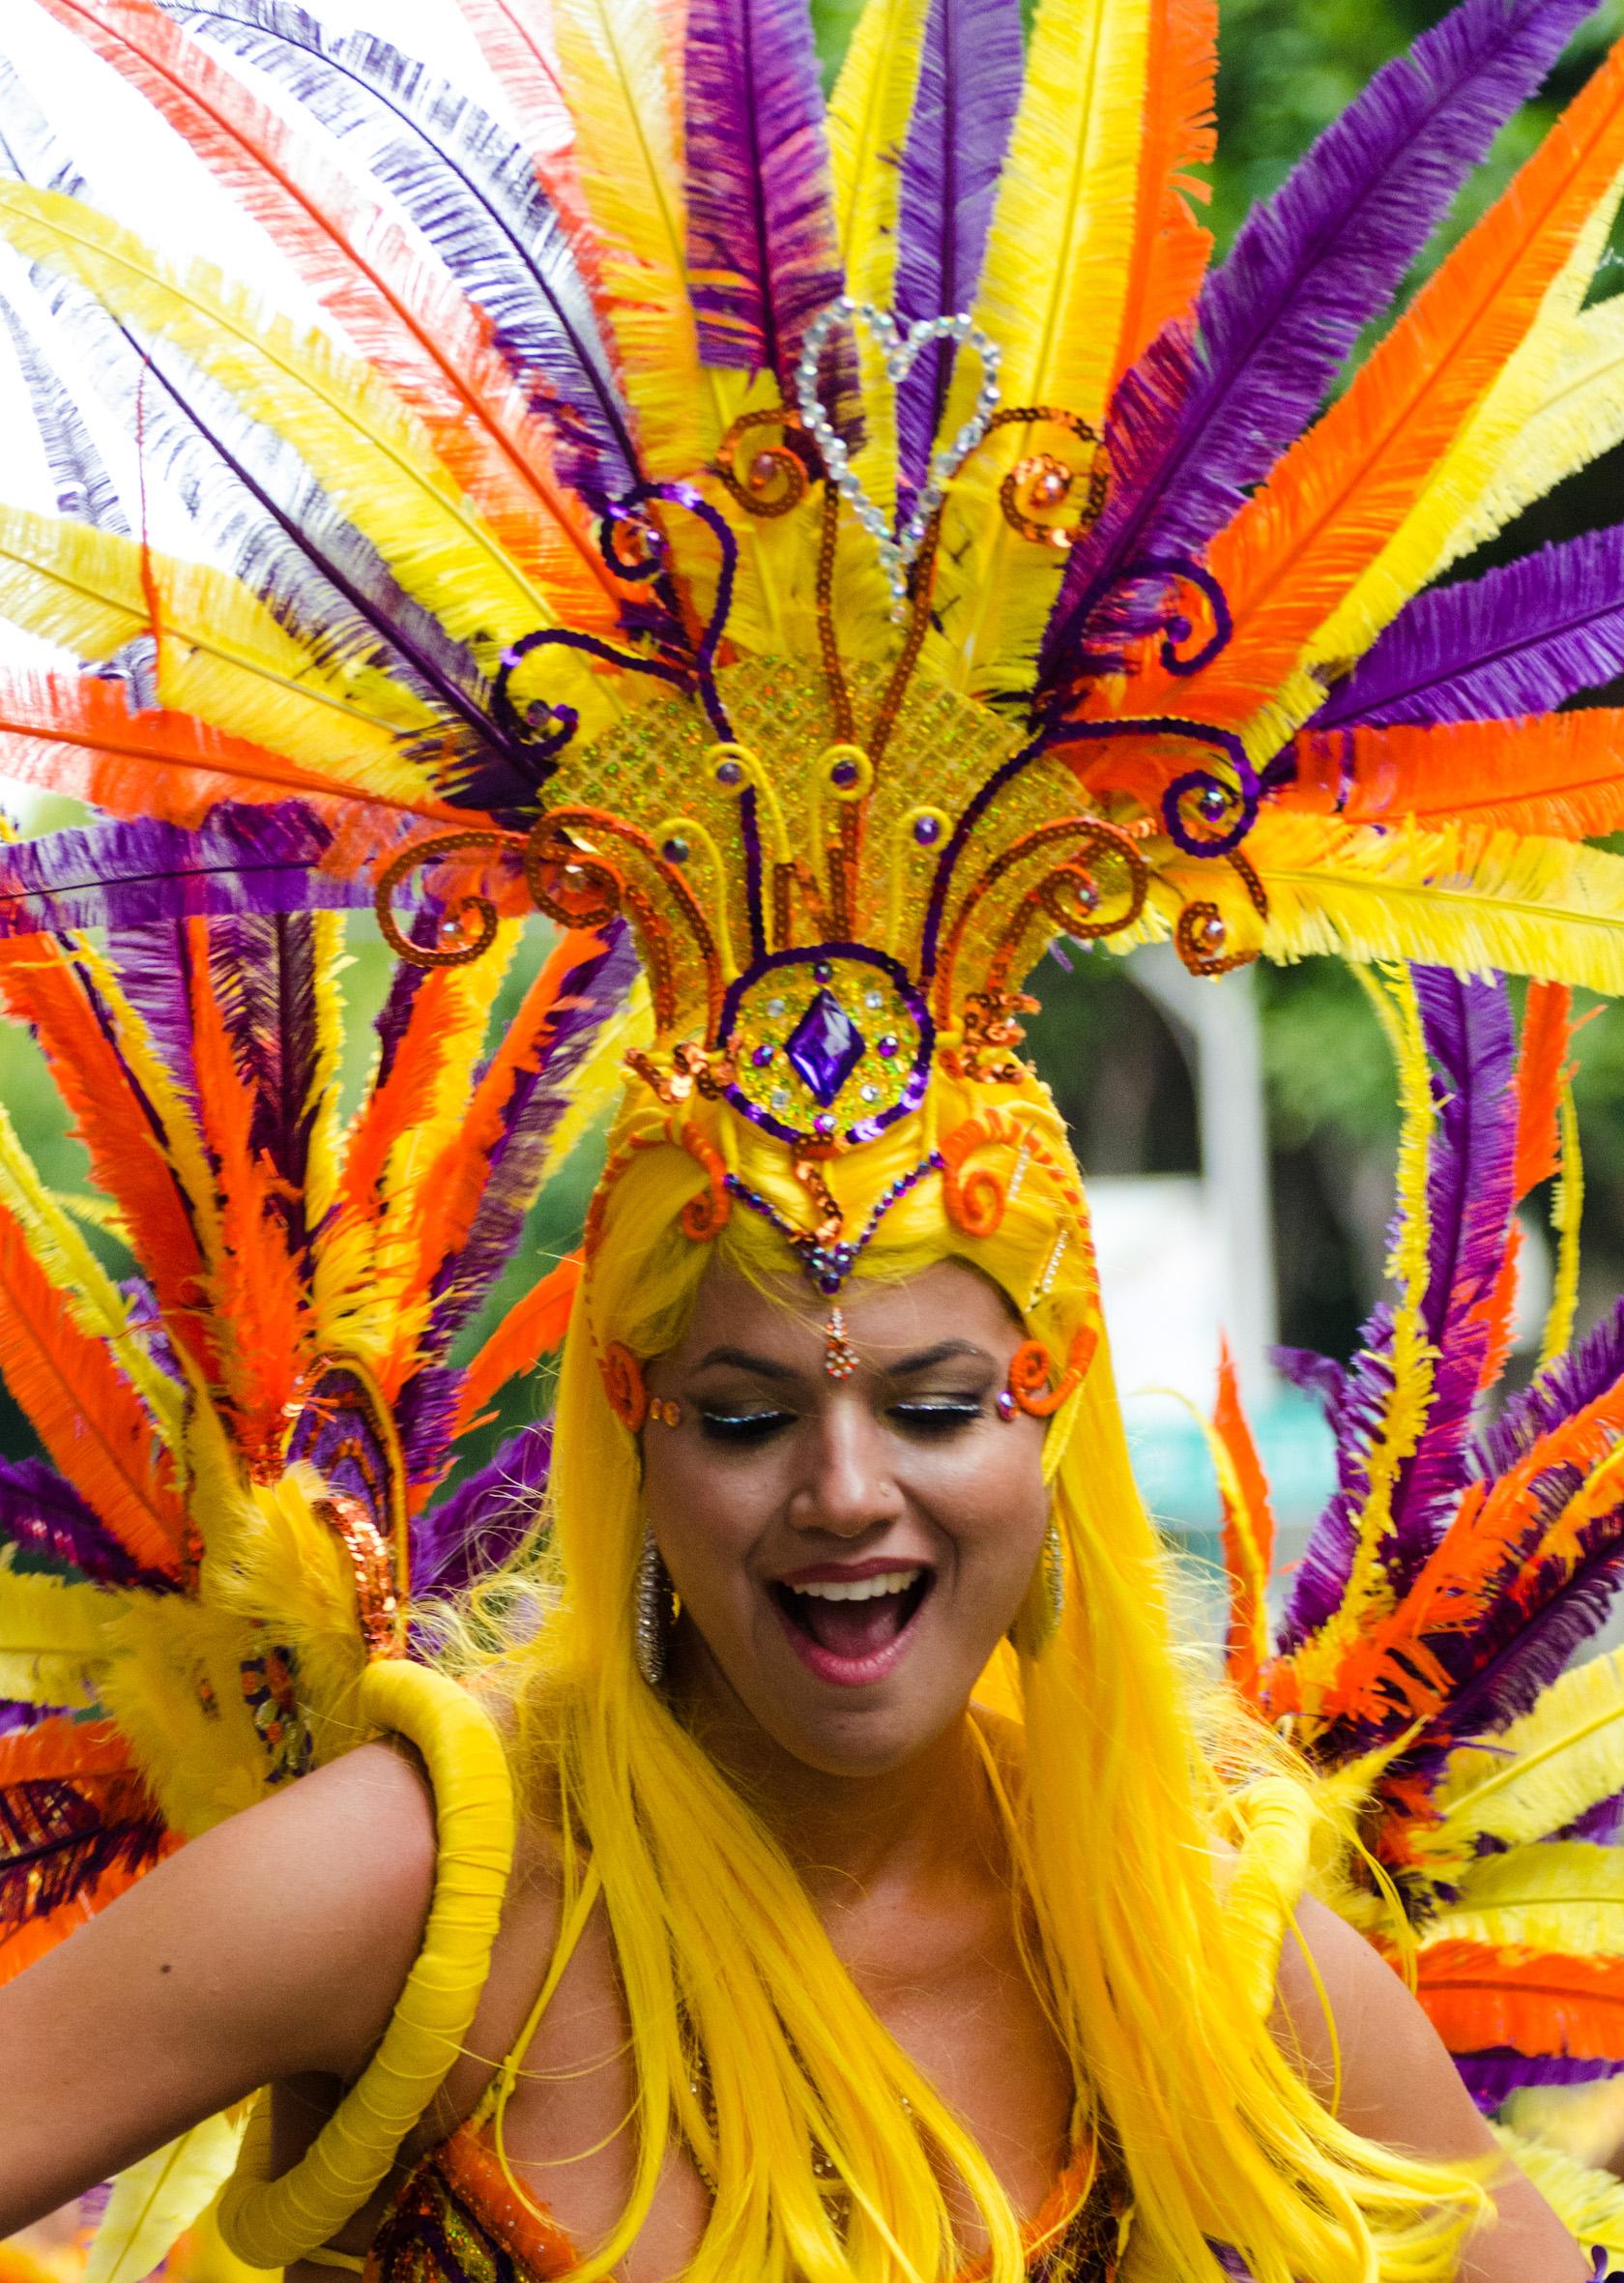 San Francisco Carnaval Parade 2012